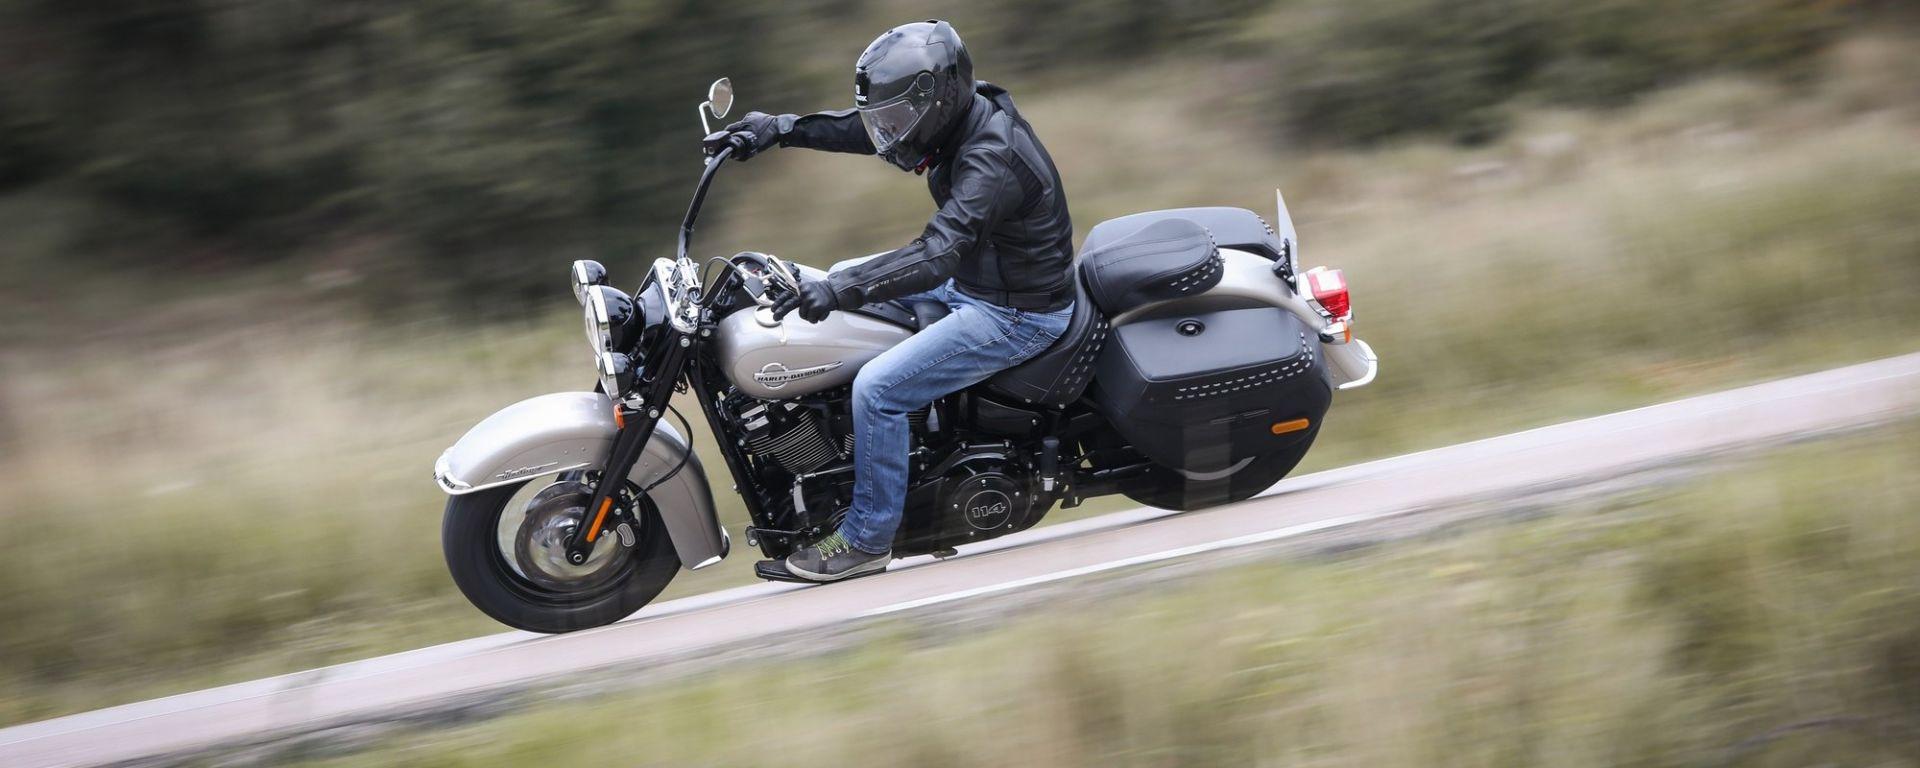 Nuova Harley Davidson Heritage Classic 2018: Elvis è l'ispirazione